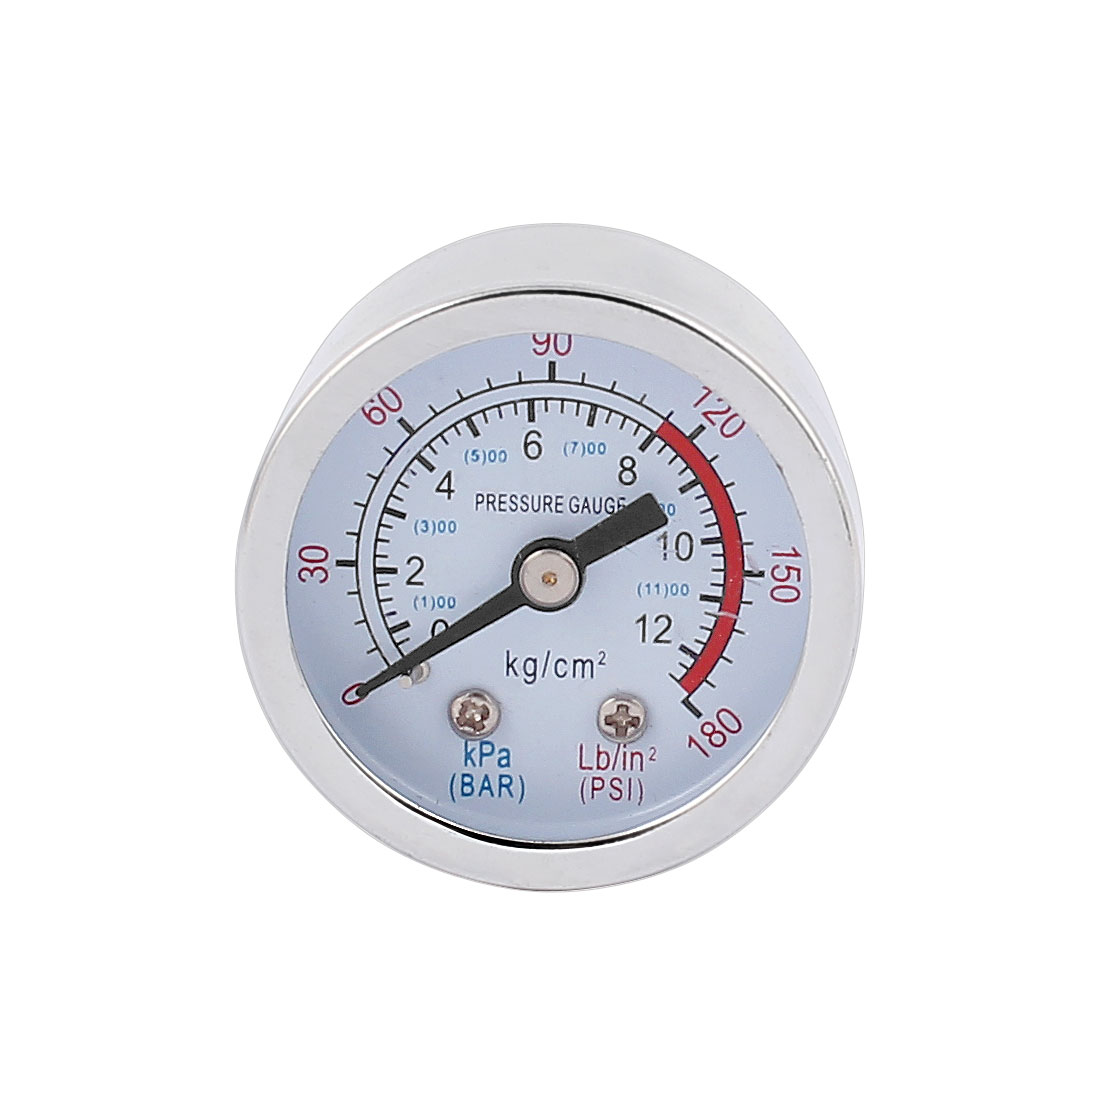 Round Shaped 0-180PSI 0-12 kg/cm2 10mm 1/8BSP Thread Dia Dial Air Pressure Gauge Measure